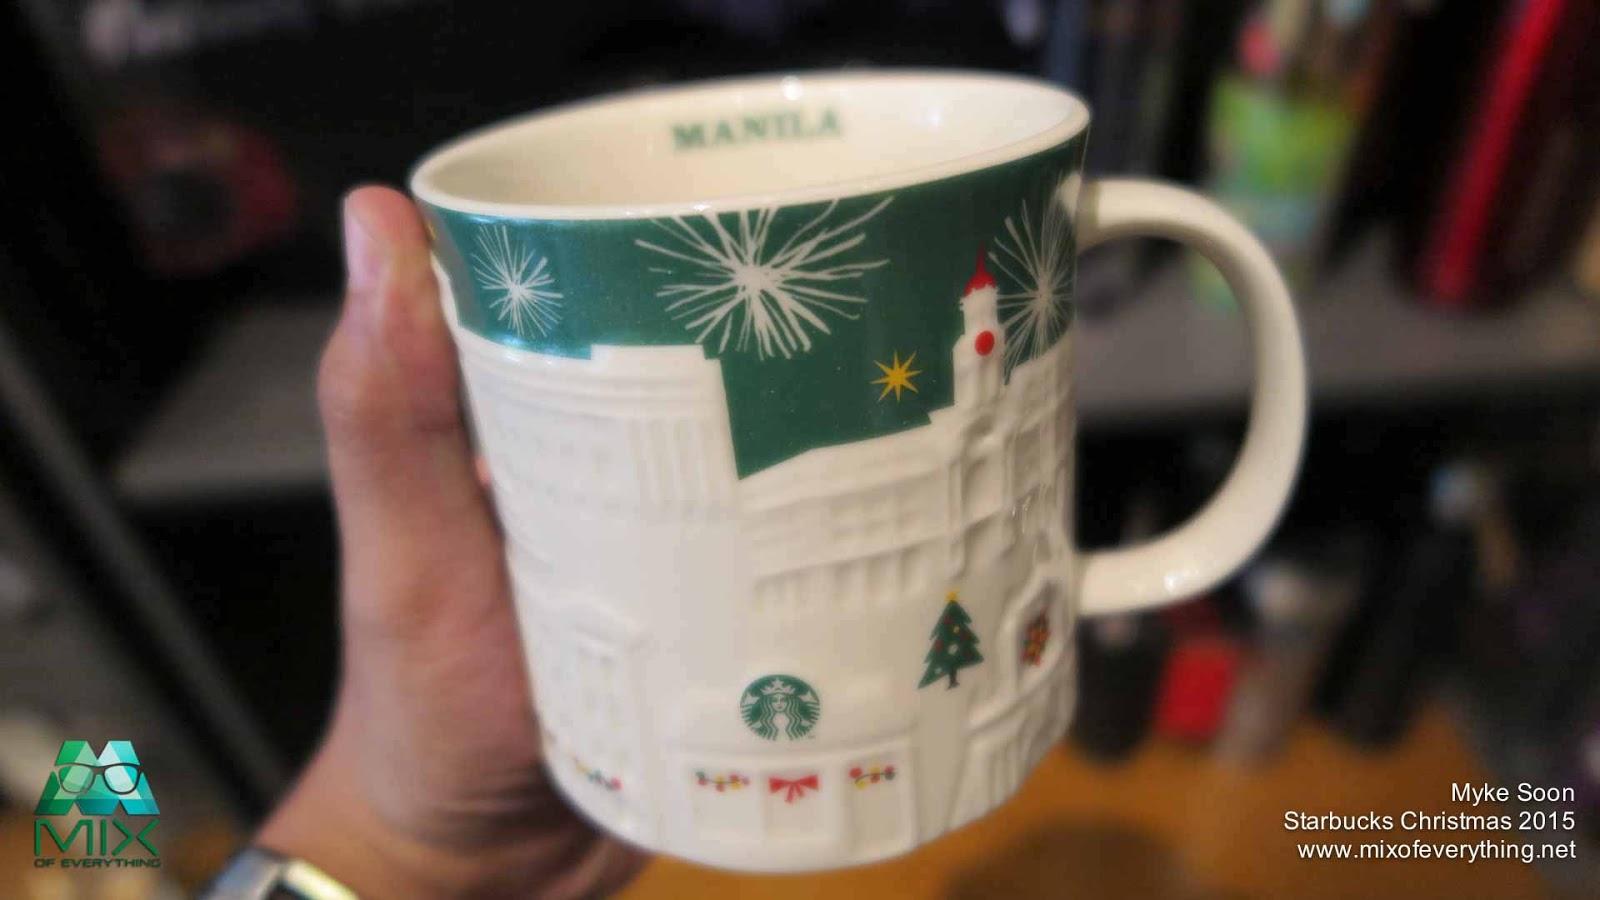 Starbucks Christmas 2015 Holiday Merchandise! - Hello! Welcome to ...